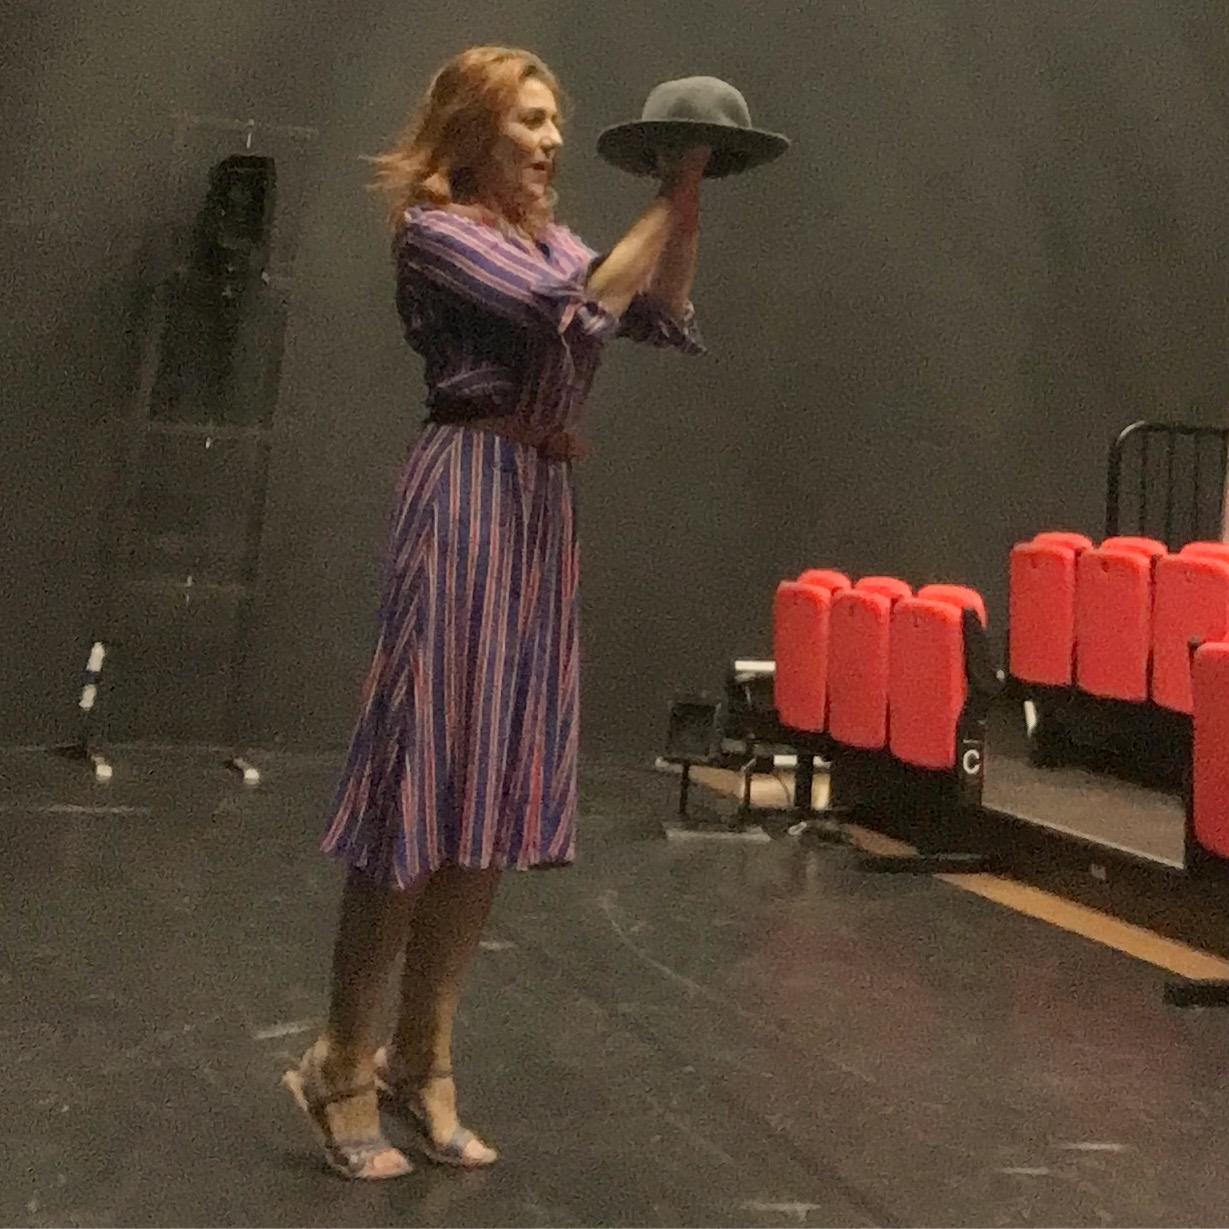 Seconda settimana di prove al teatro Elfo Puccini per EINSTEIN & ME…e mi piace sempre di più!